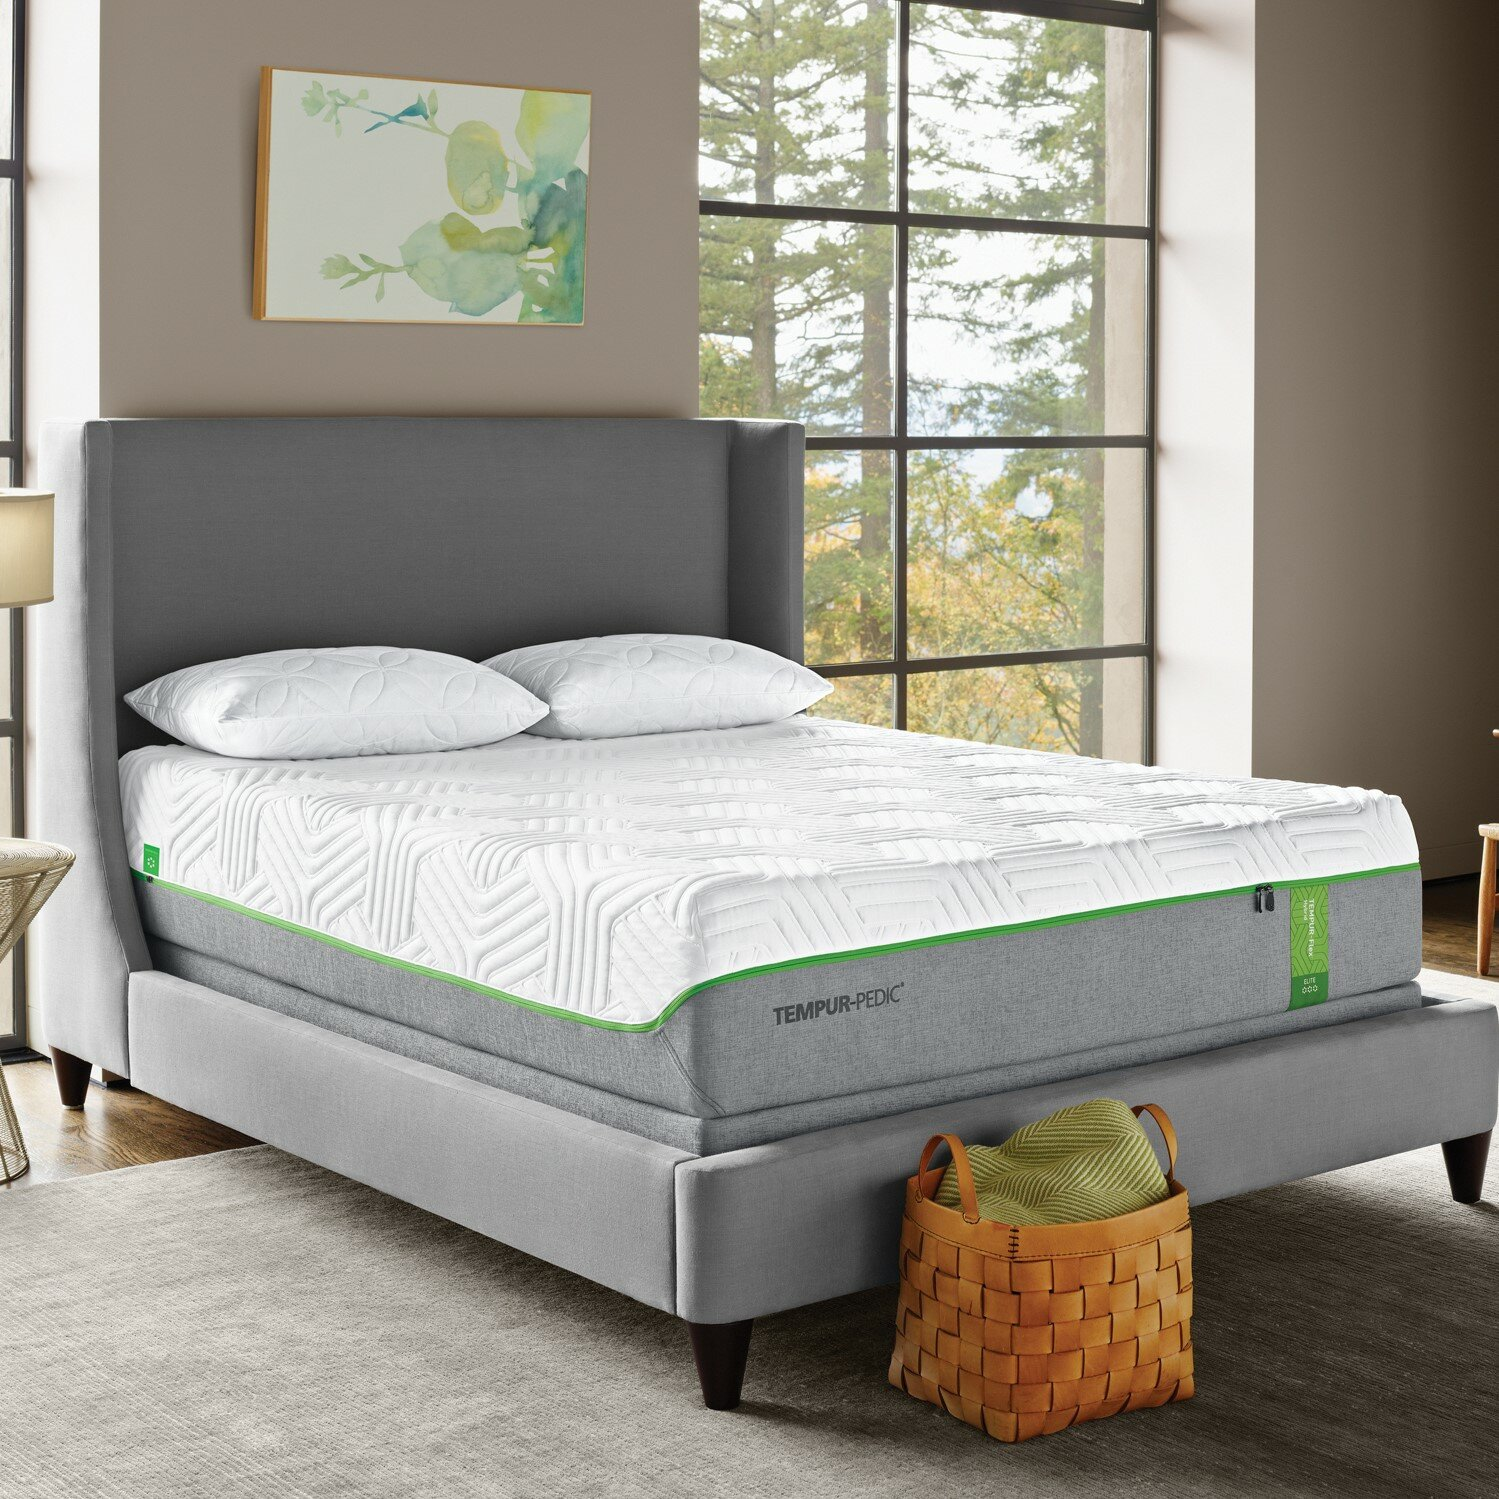 tempur pedic tempur flex elite 125 medium plush tight top mattress wayfair - Tempur Pedic Full Mattress